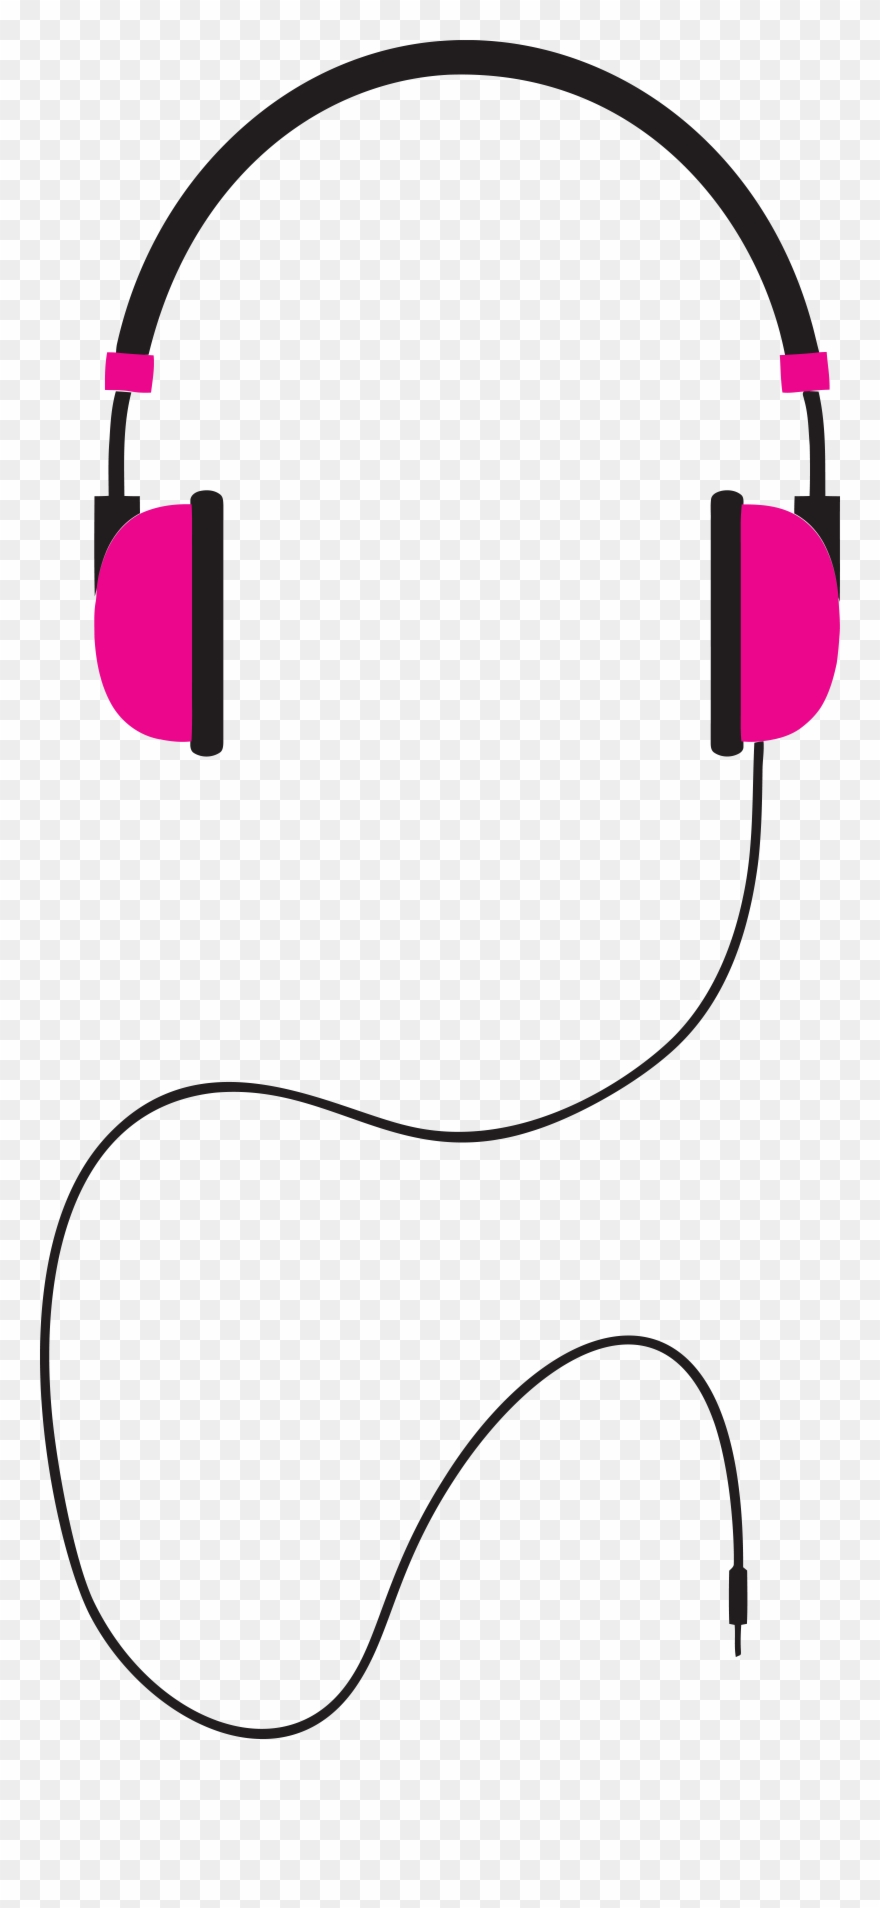 Headphones With Cord Clip Art.